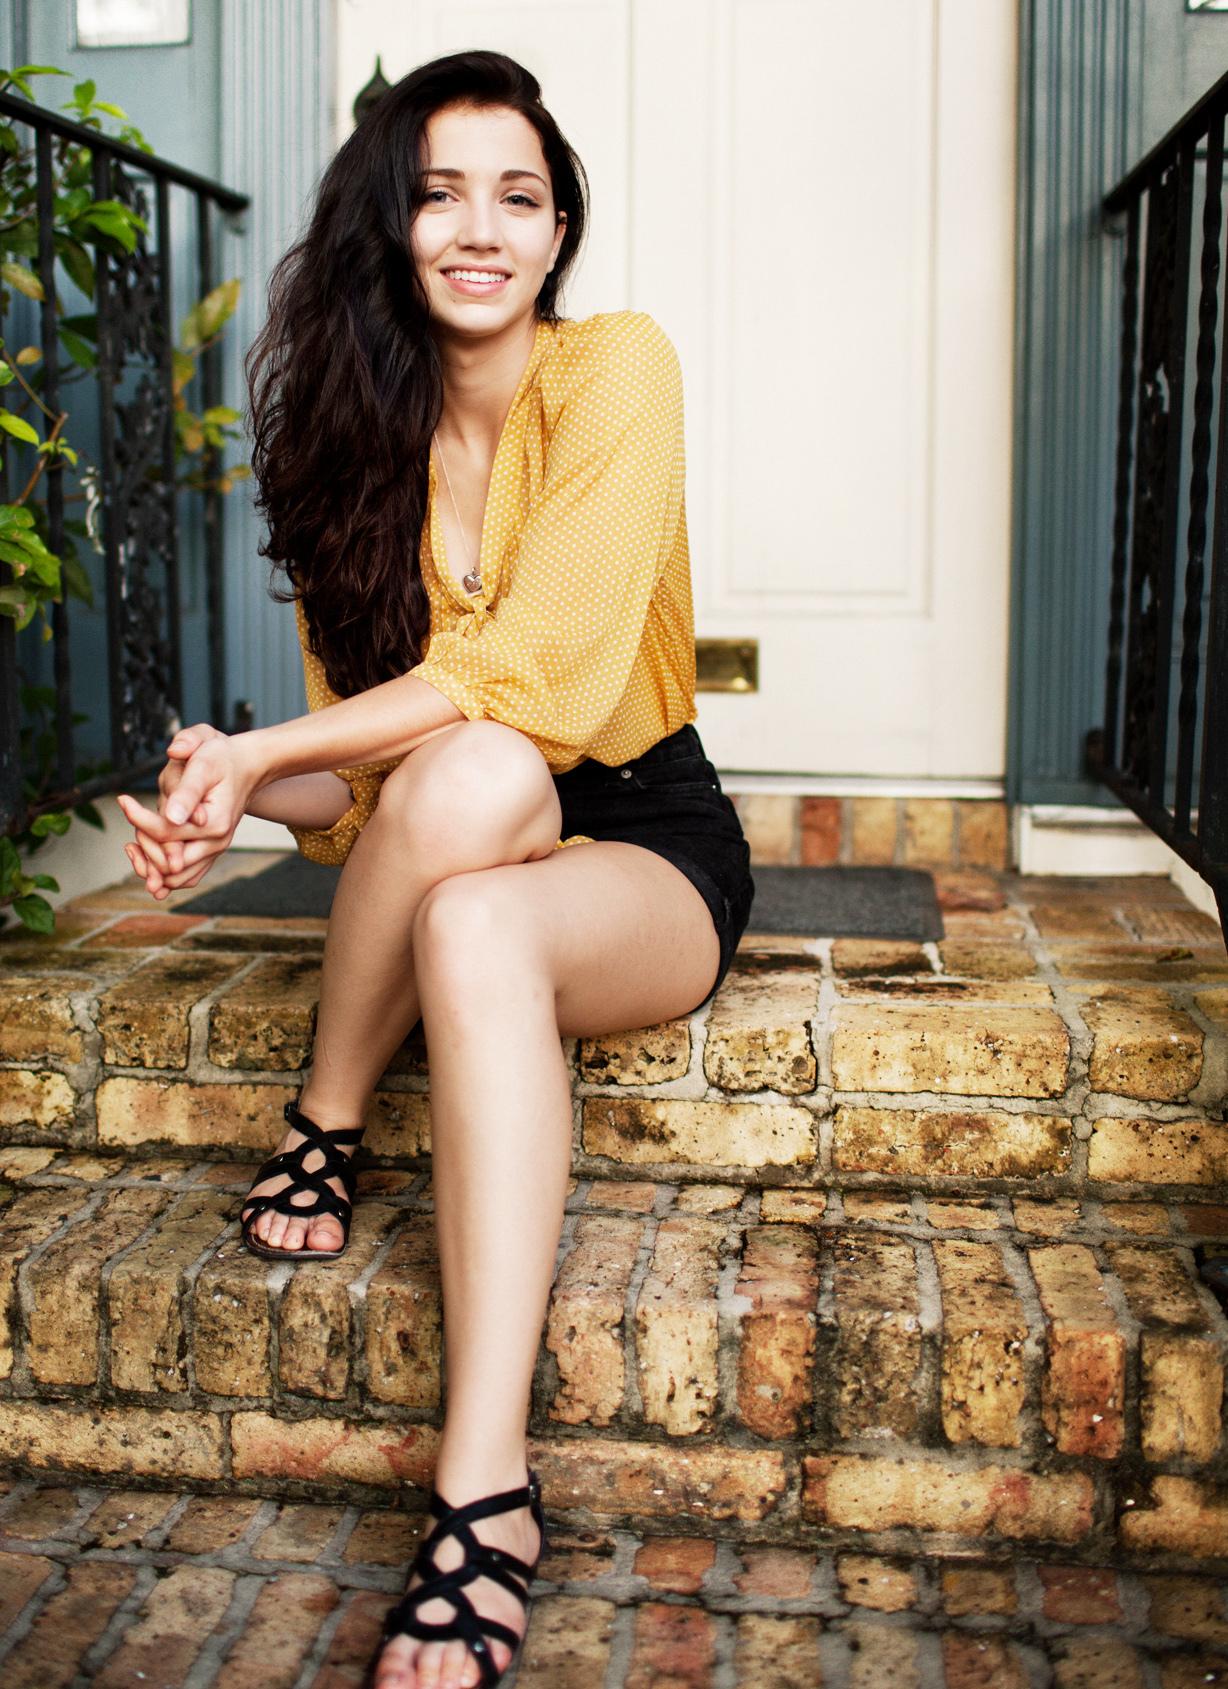 Sexy Latina Feet Tumblr Cheap emily-rudd | maids | pinterest | celebrity feet, adriana lima and lima